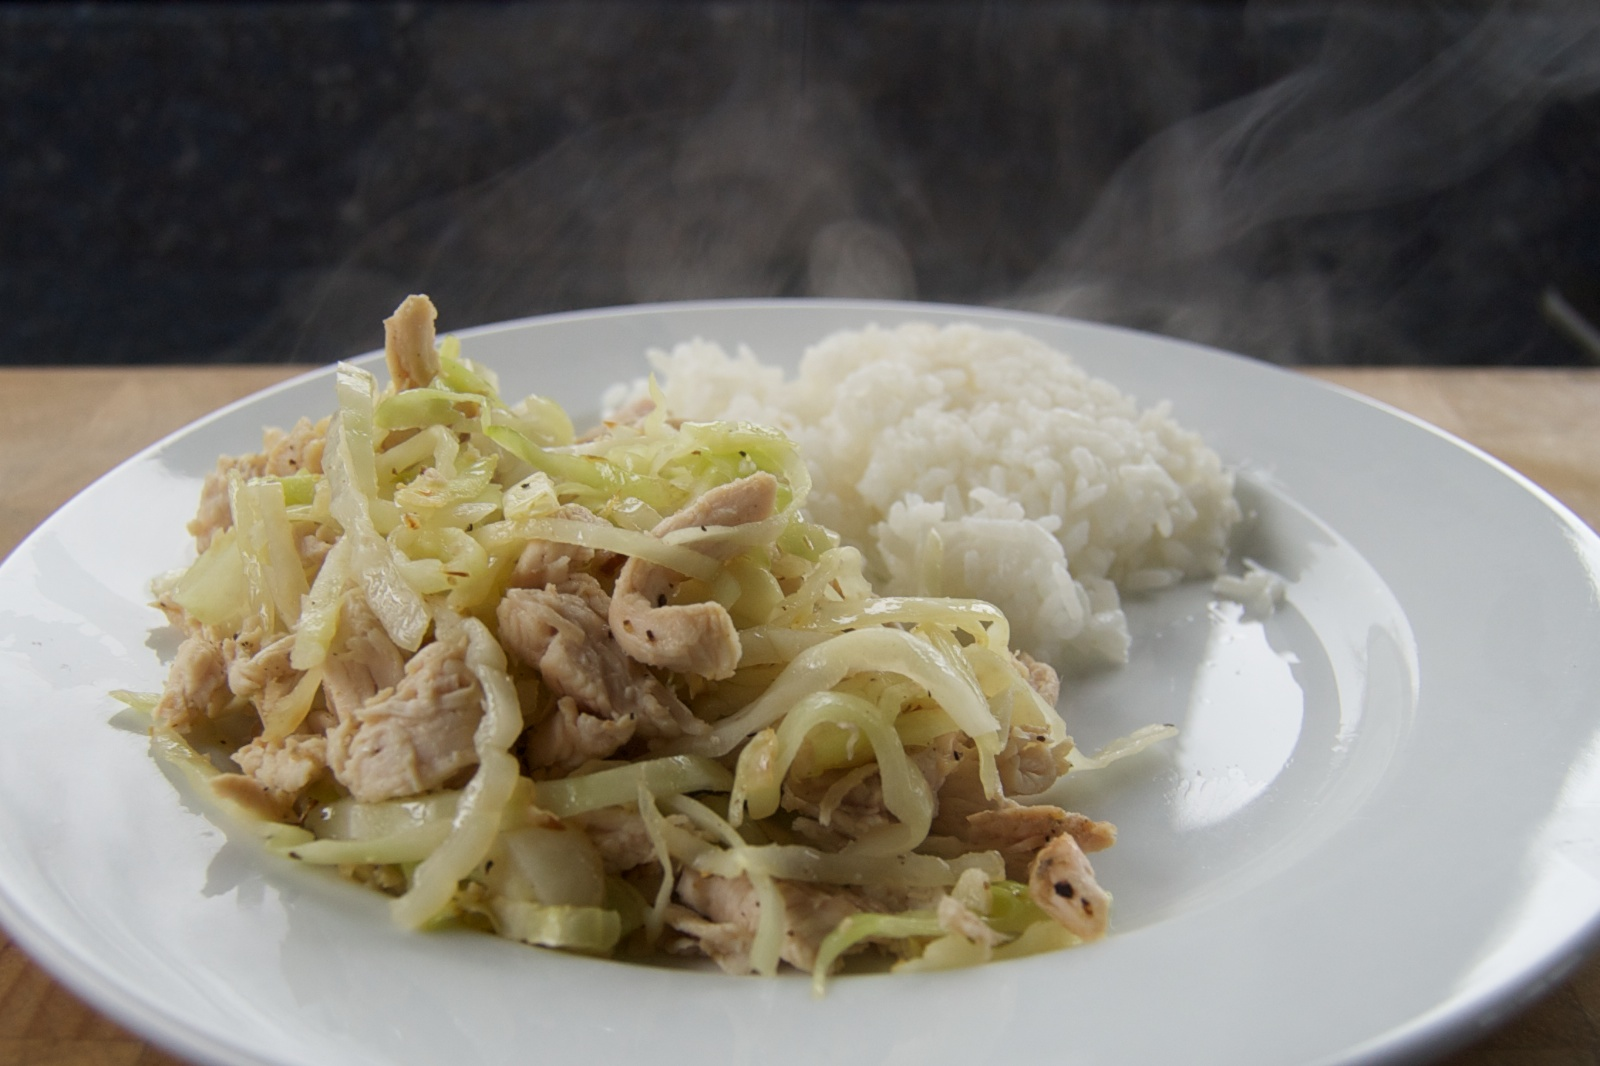 http://blog.rickk.com/food/2012/10/24/ate.2012.10.24.l.jpg